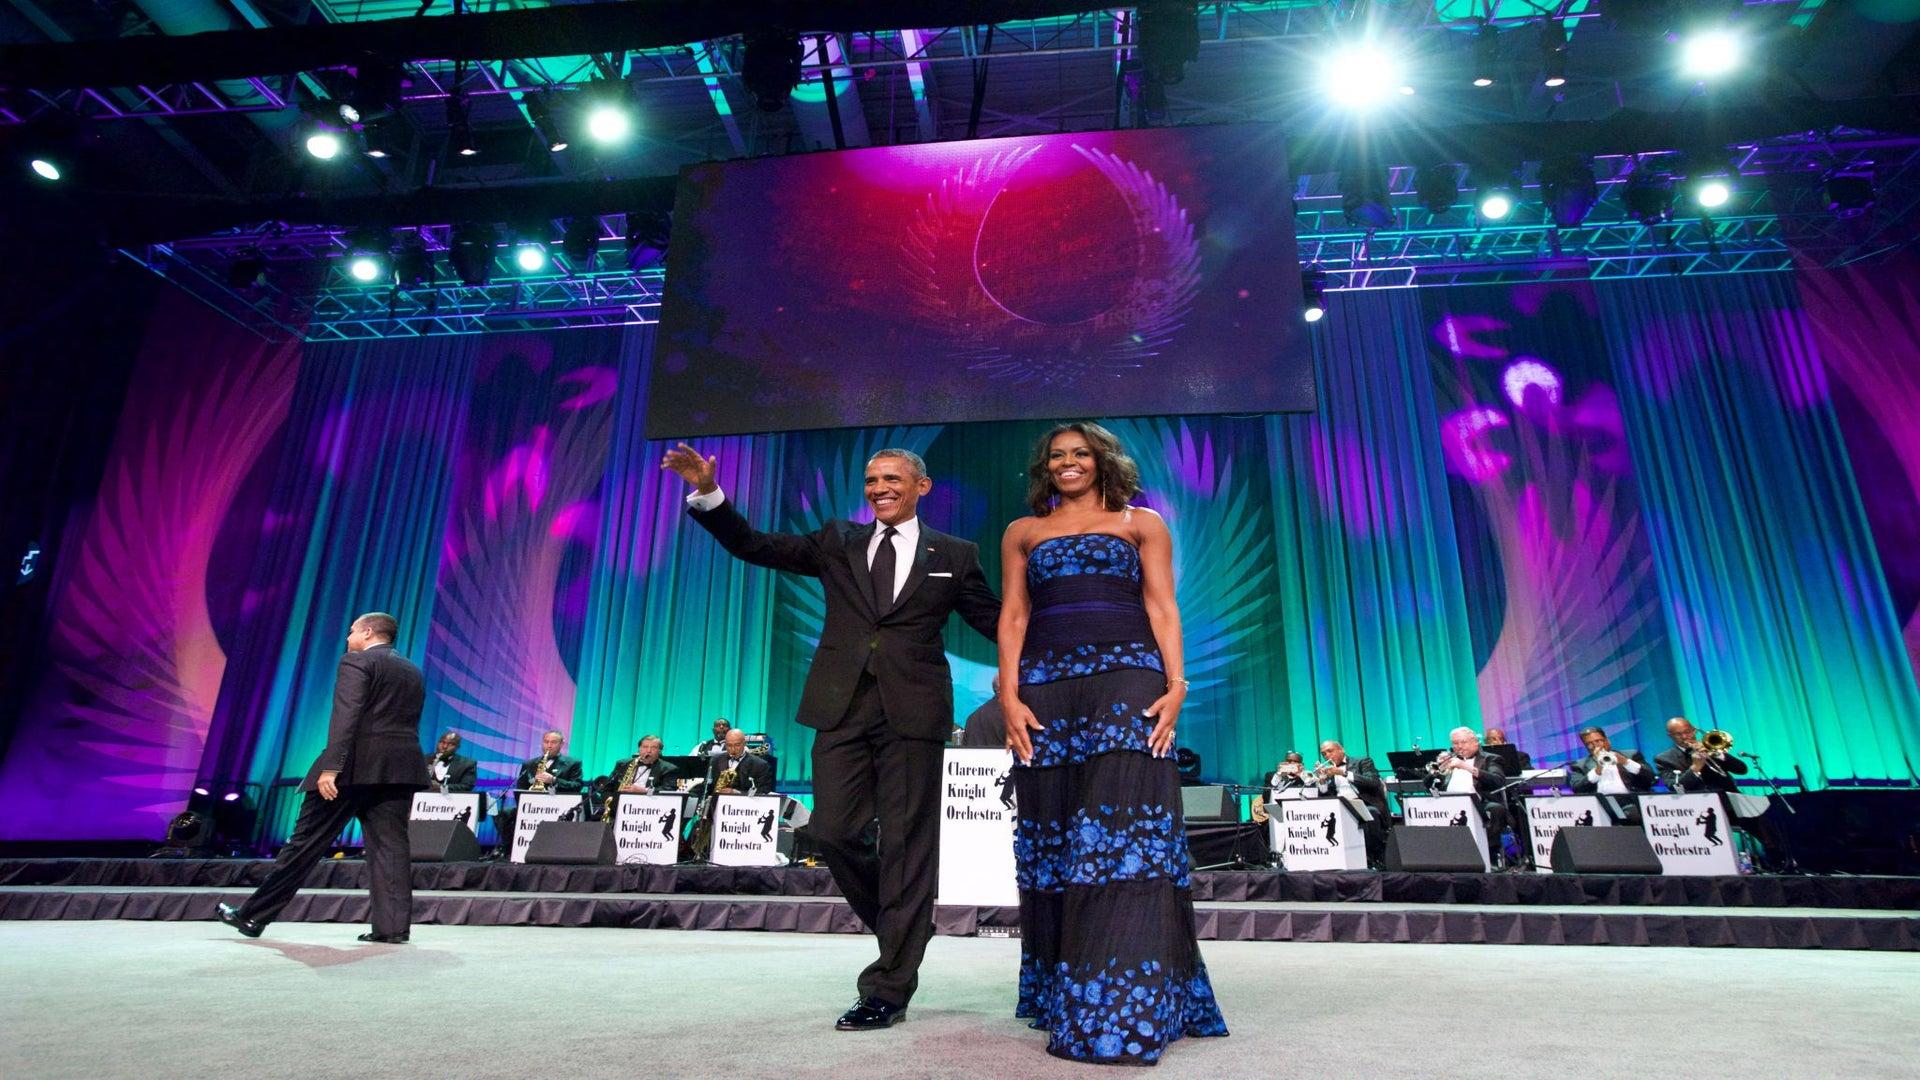 President Obama Makes Black Women the Focus in Congressional Black Caucus Speech